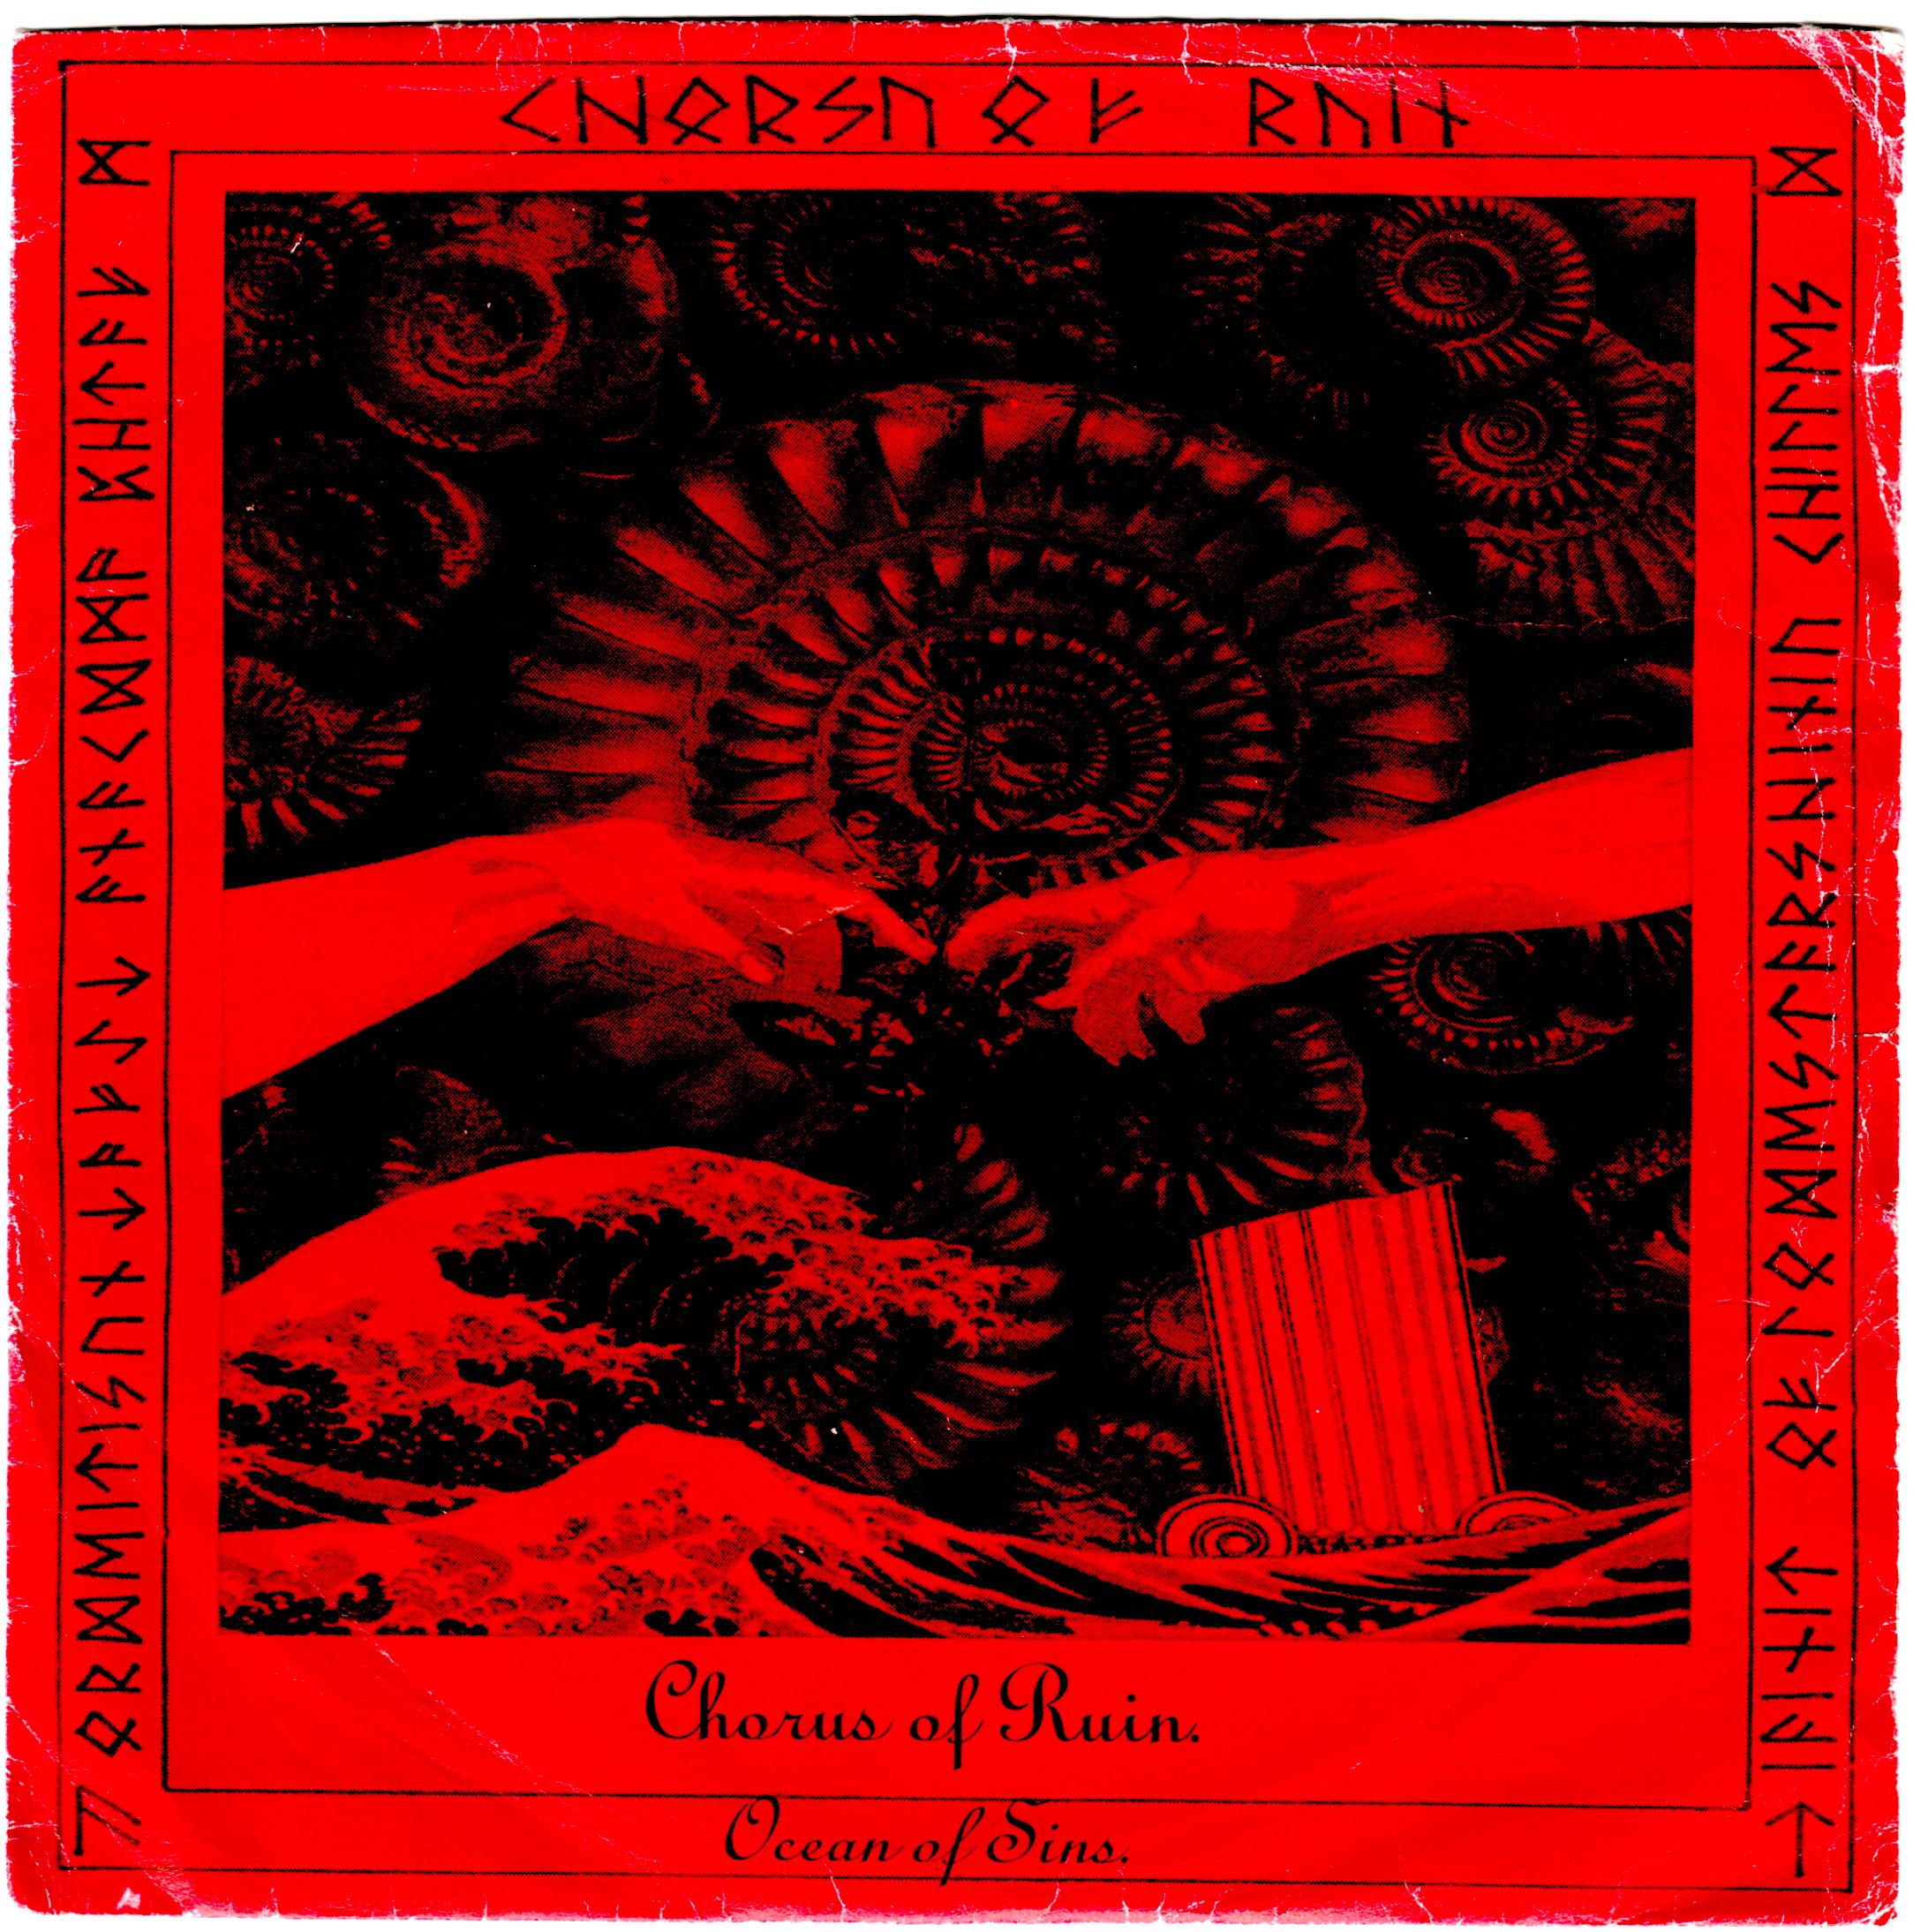 Chorus Of Ruin - Ocean Of Sins